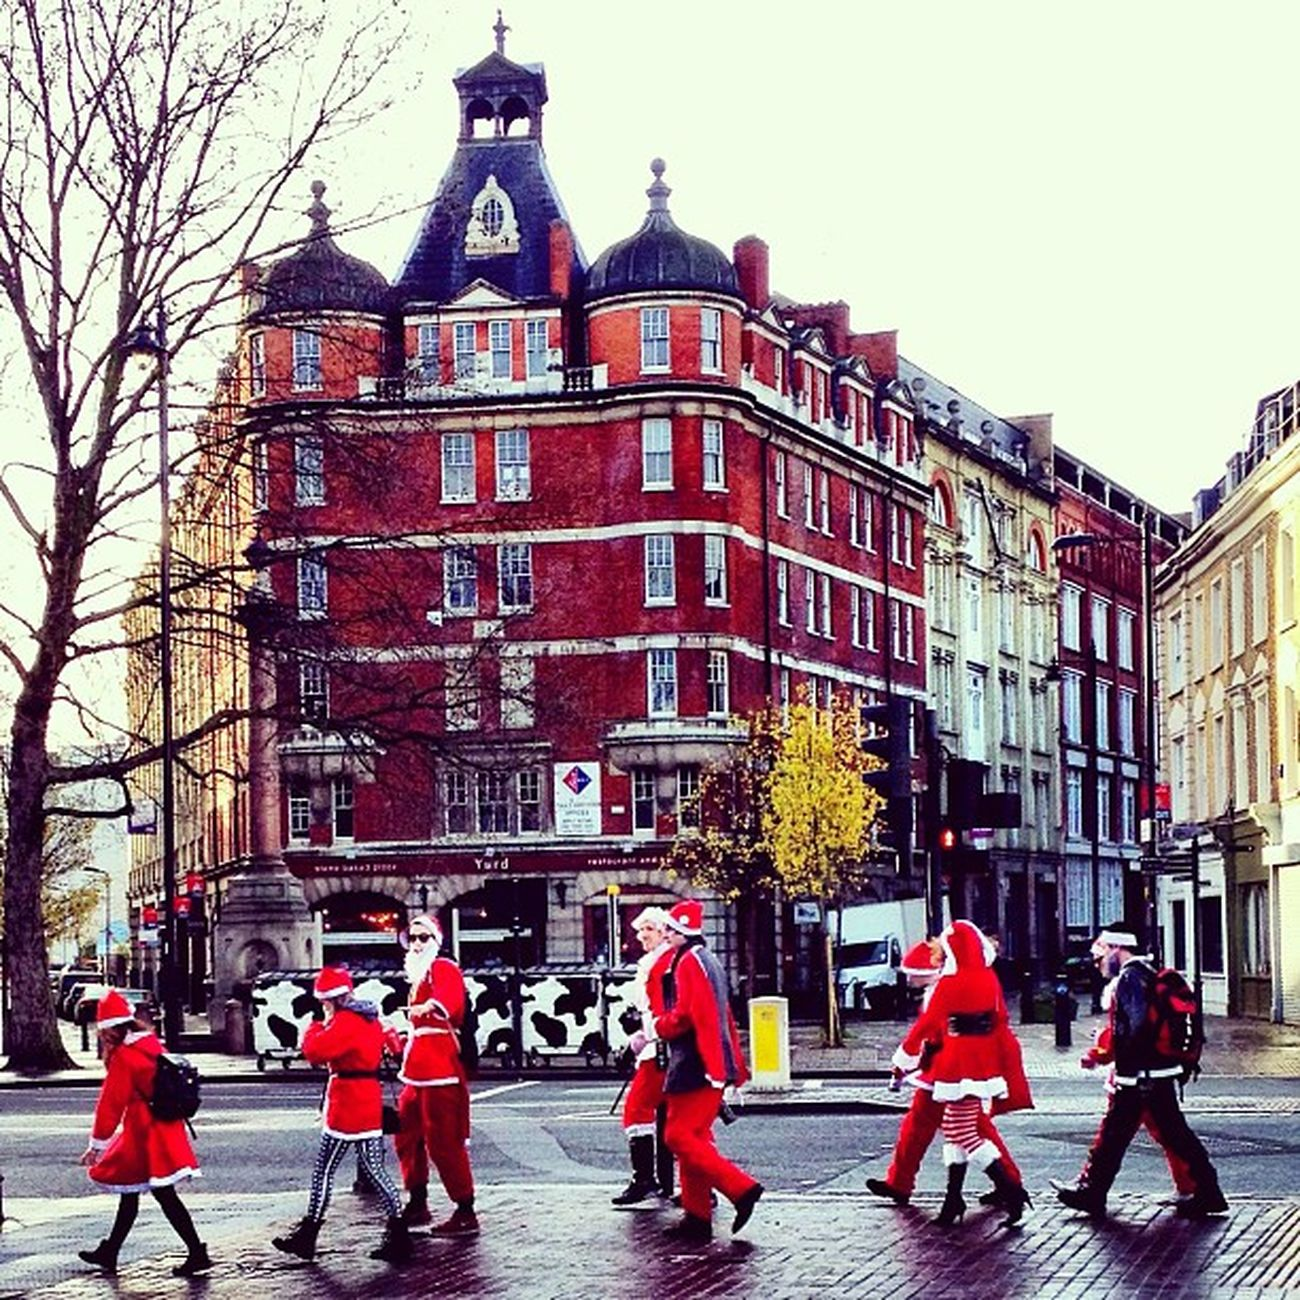 Santa's on the way ???? #christmas #santa #london #hoxton #all_shots #alan_in_london #jj #insta_london #insta_uk London Christmas Santa All_shots Jj  Hoxton Insta_uk Alan_in_london Insta_london Santacon2012